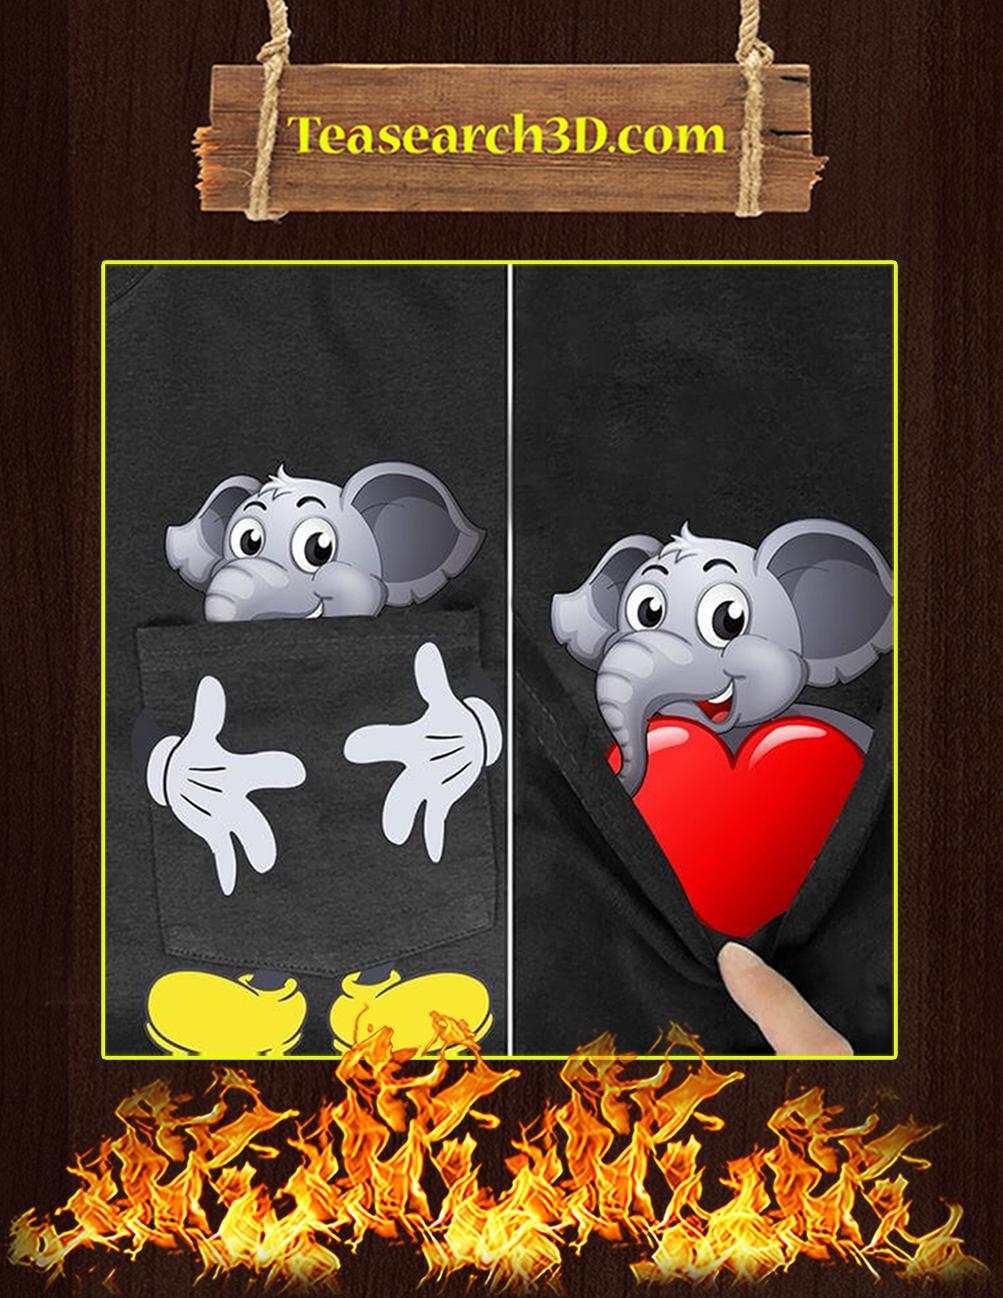 Funny Elephant With Heart Pocket T-shirt